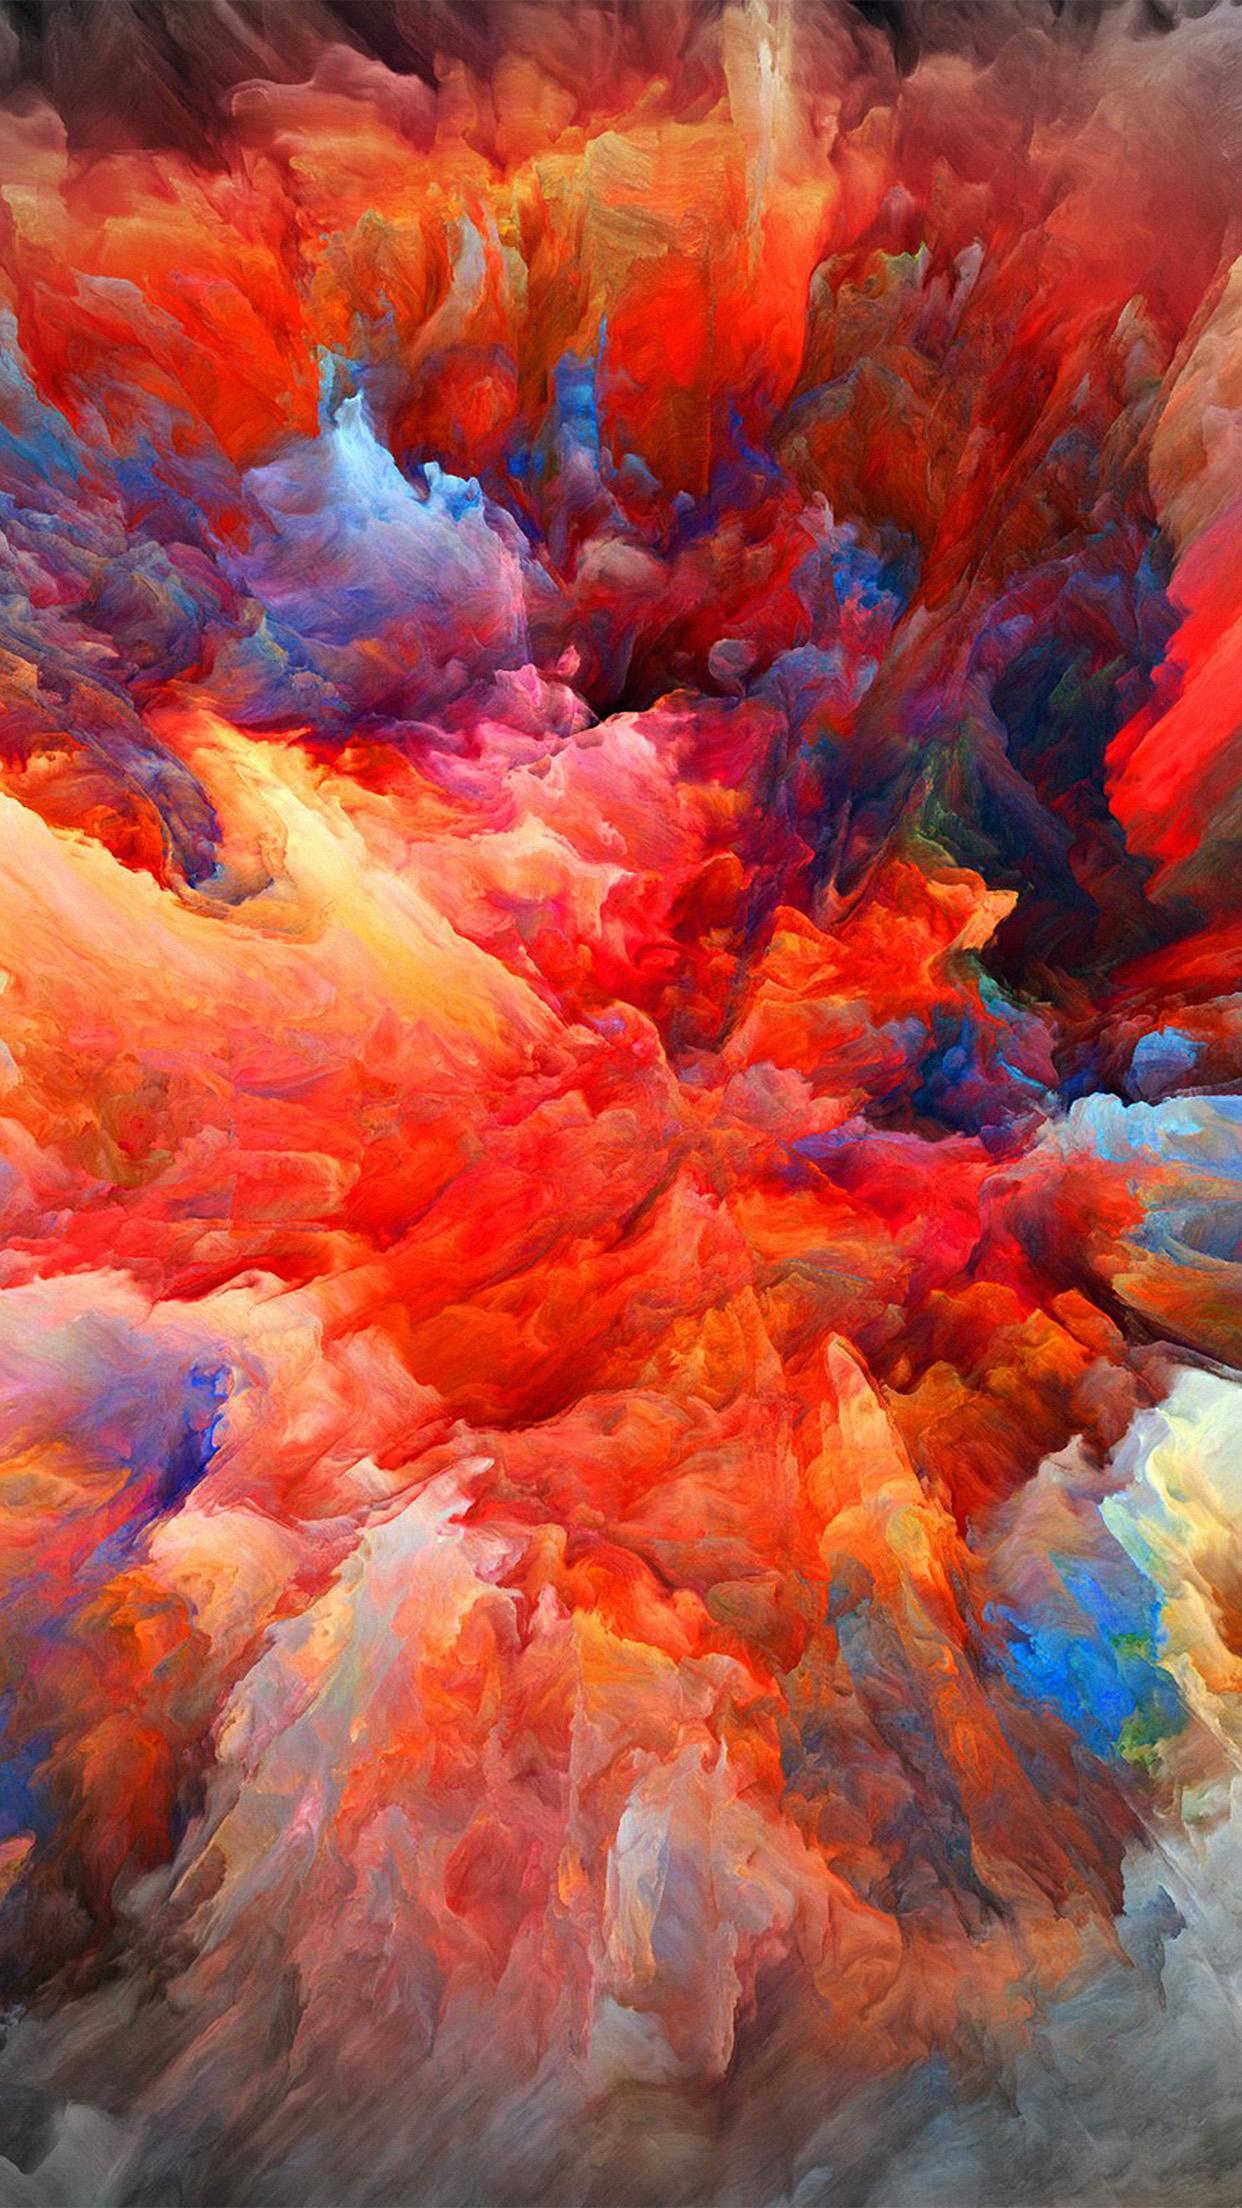 free photo paint color explosion explosion effect creative